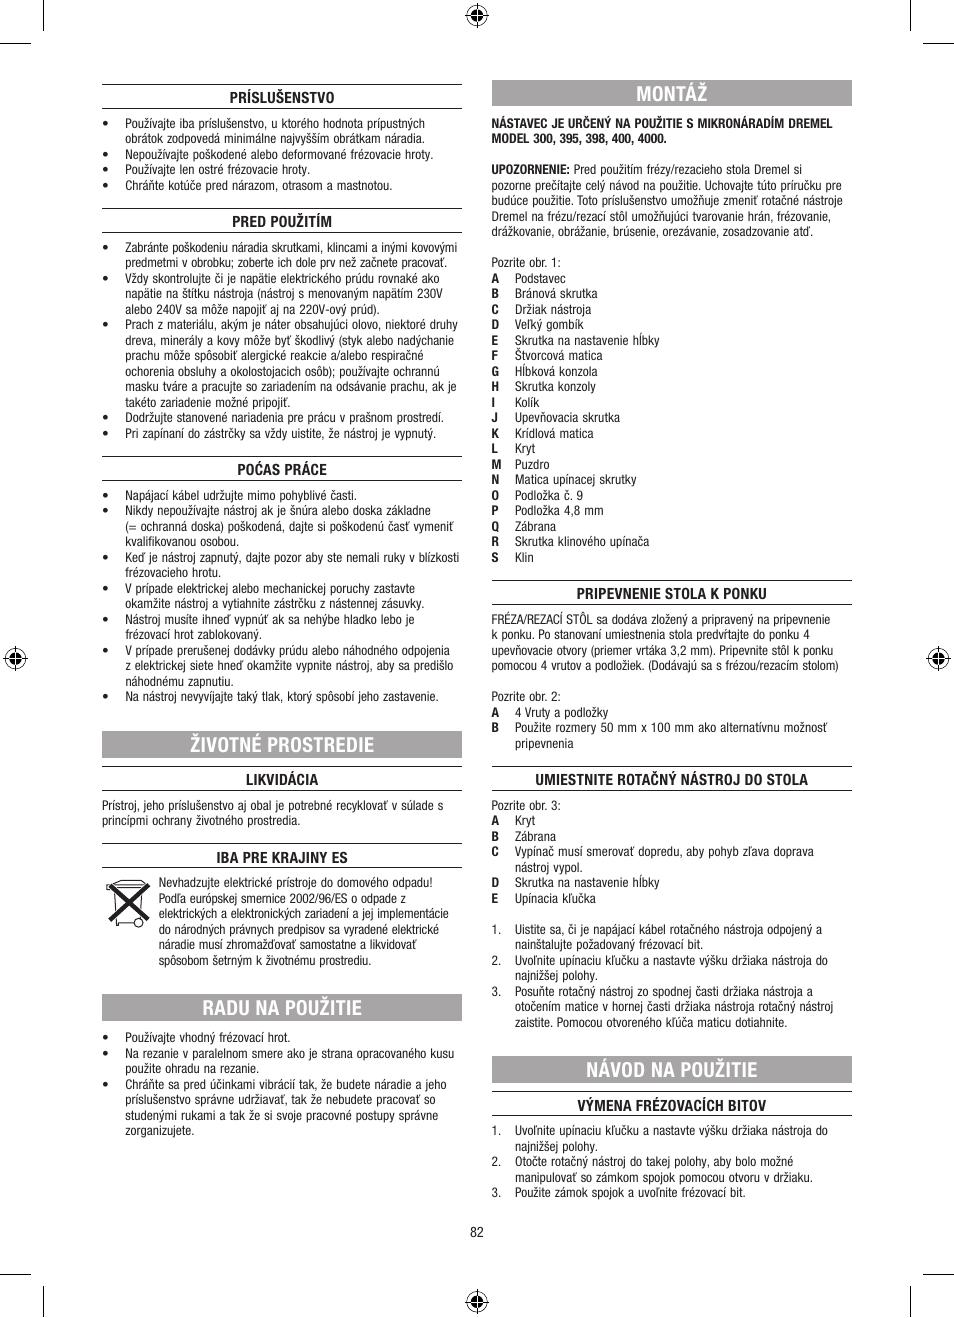 d22c03835 Životné prostredie, Radu na použitie, Montáž | Dremel Столик для  фрезерования User Manual | Page 82 / 84